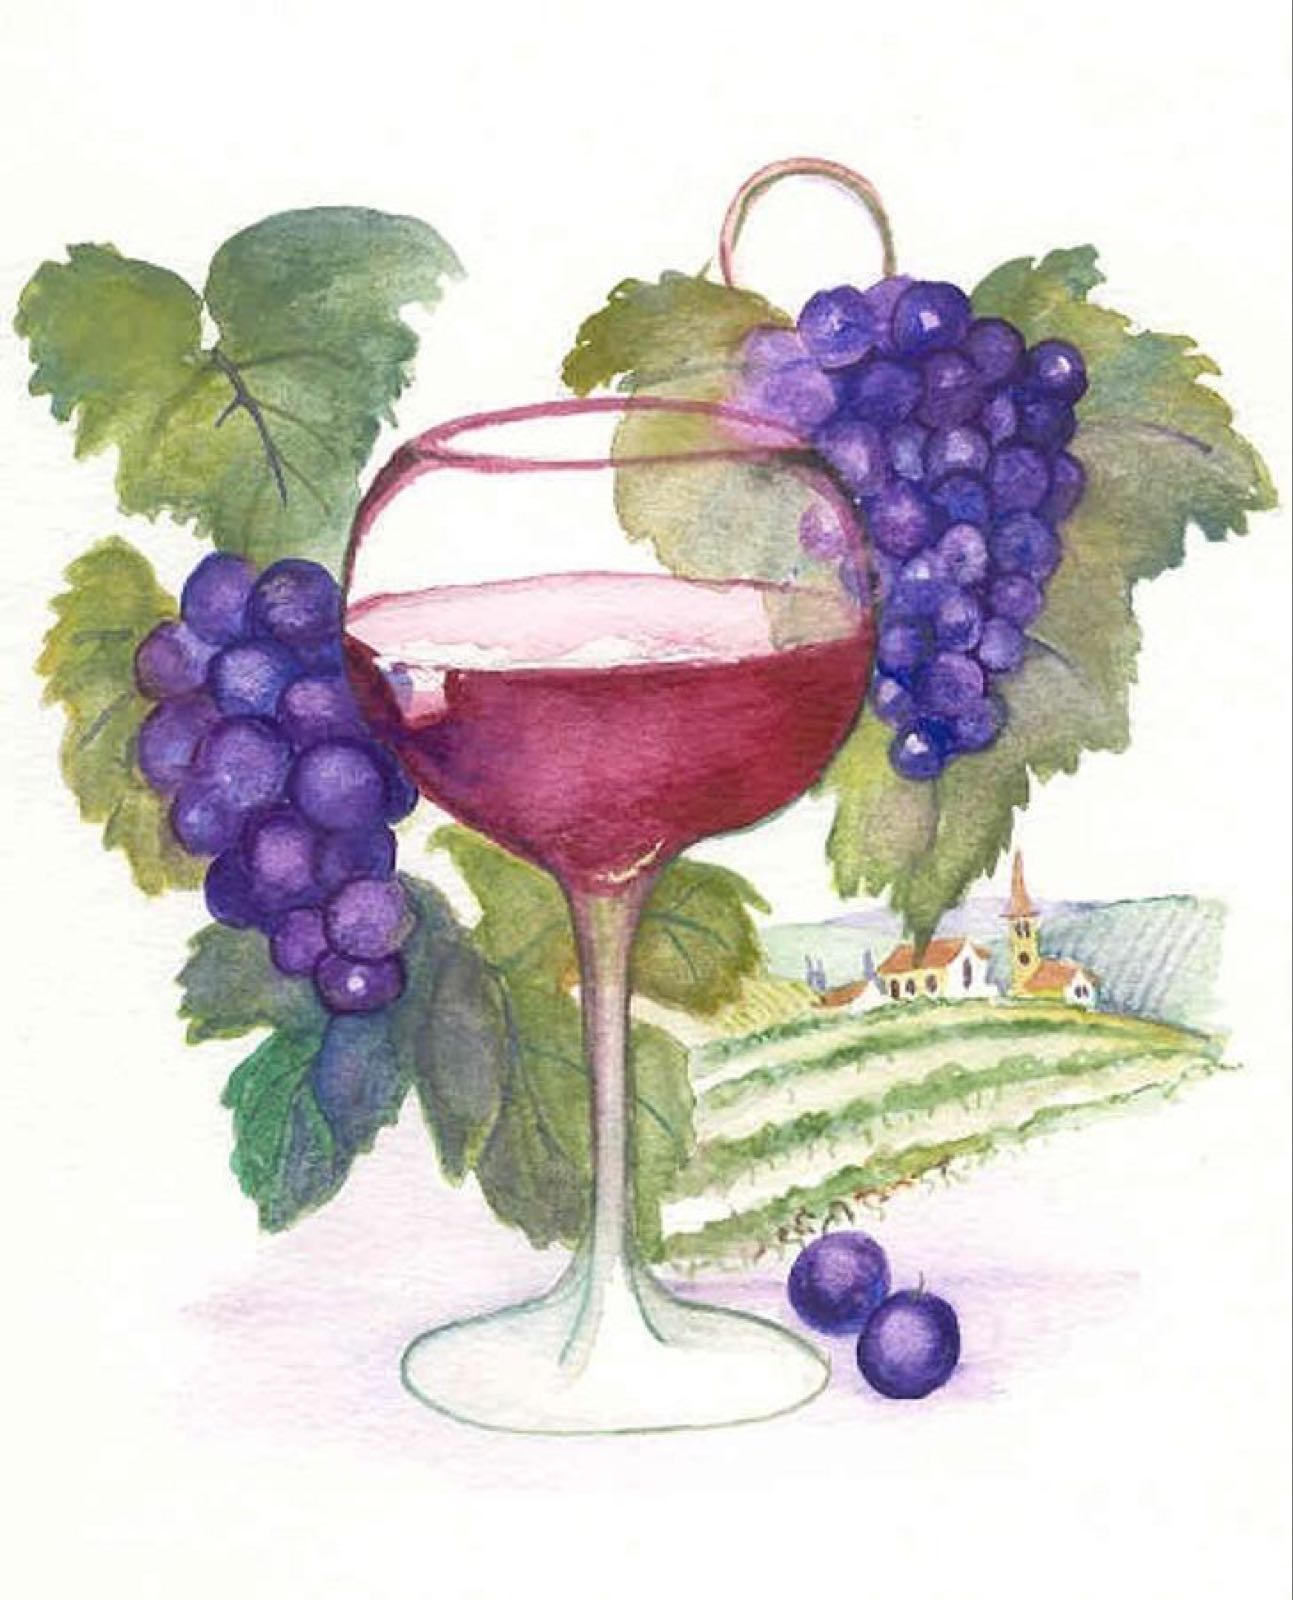 'Fruit of the Vine' Furzedown Gallery Mini Card